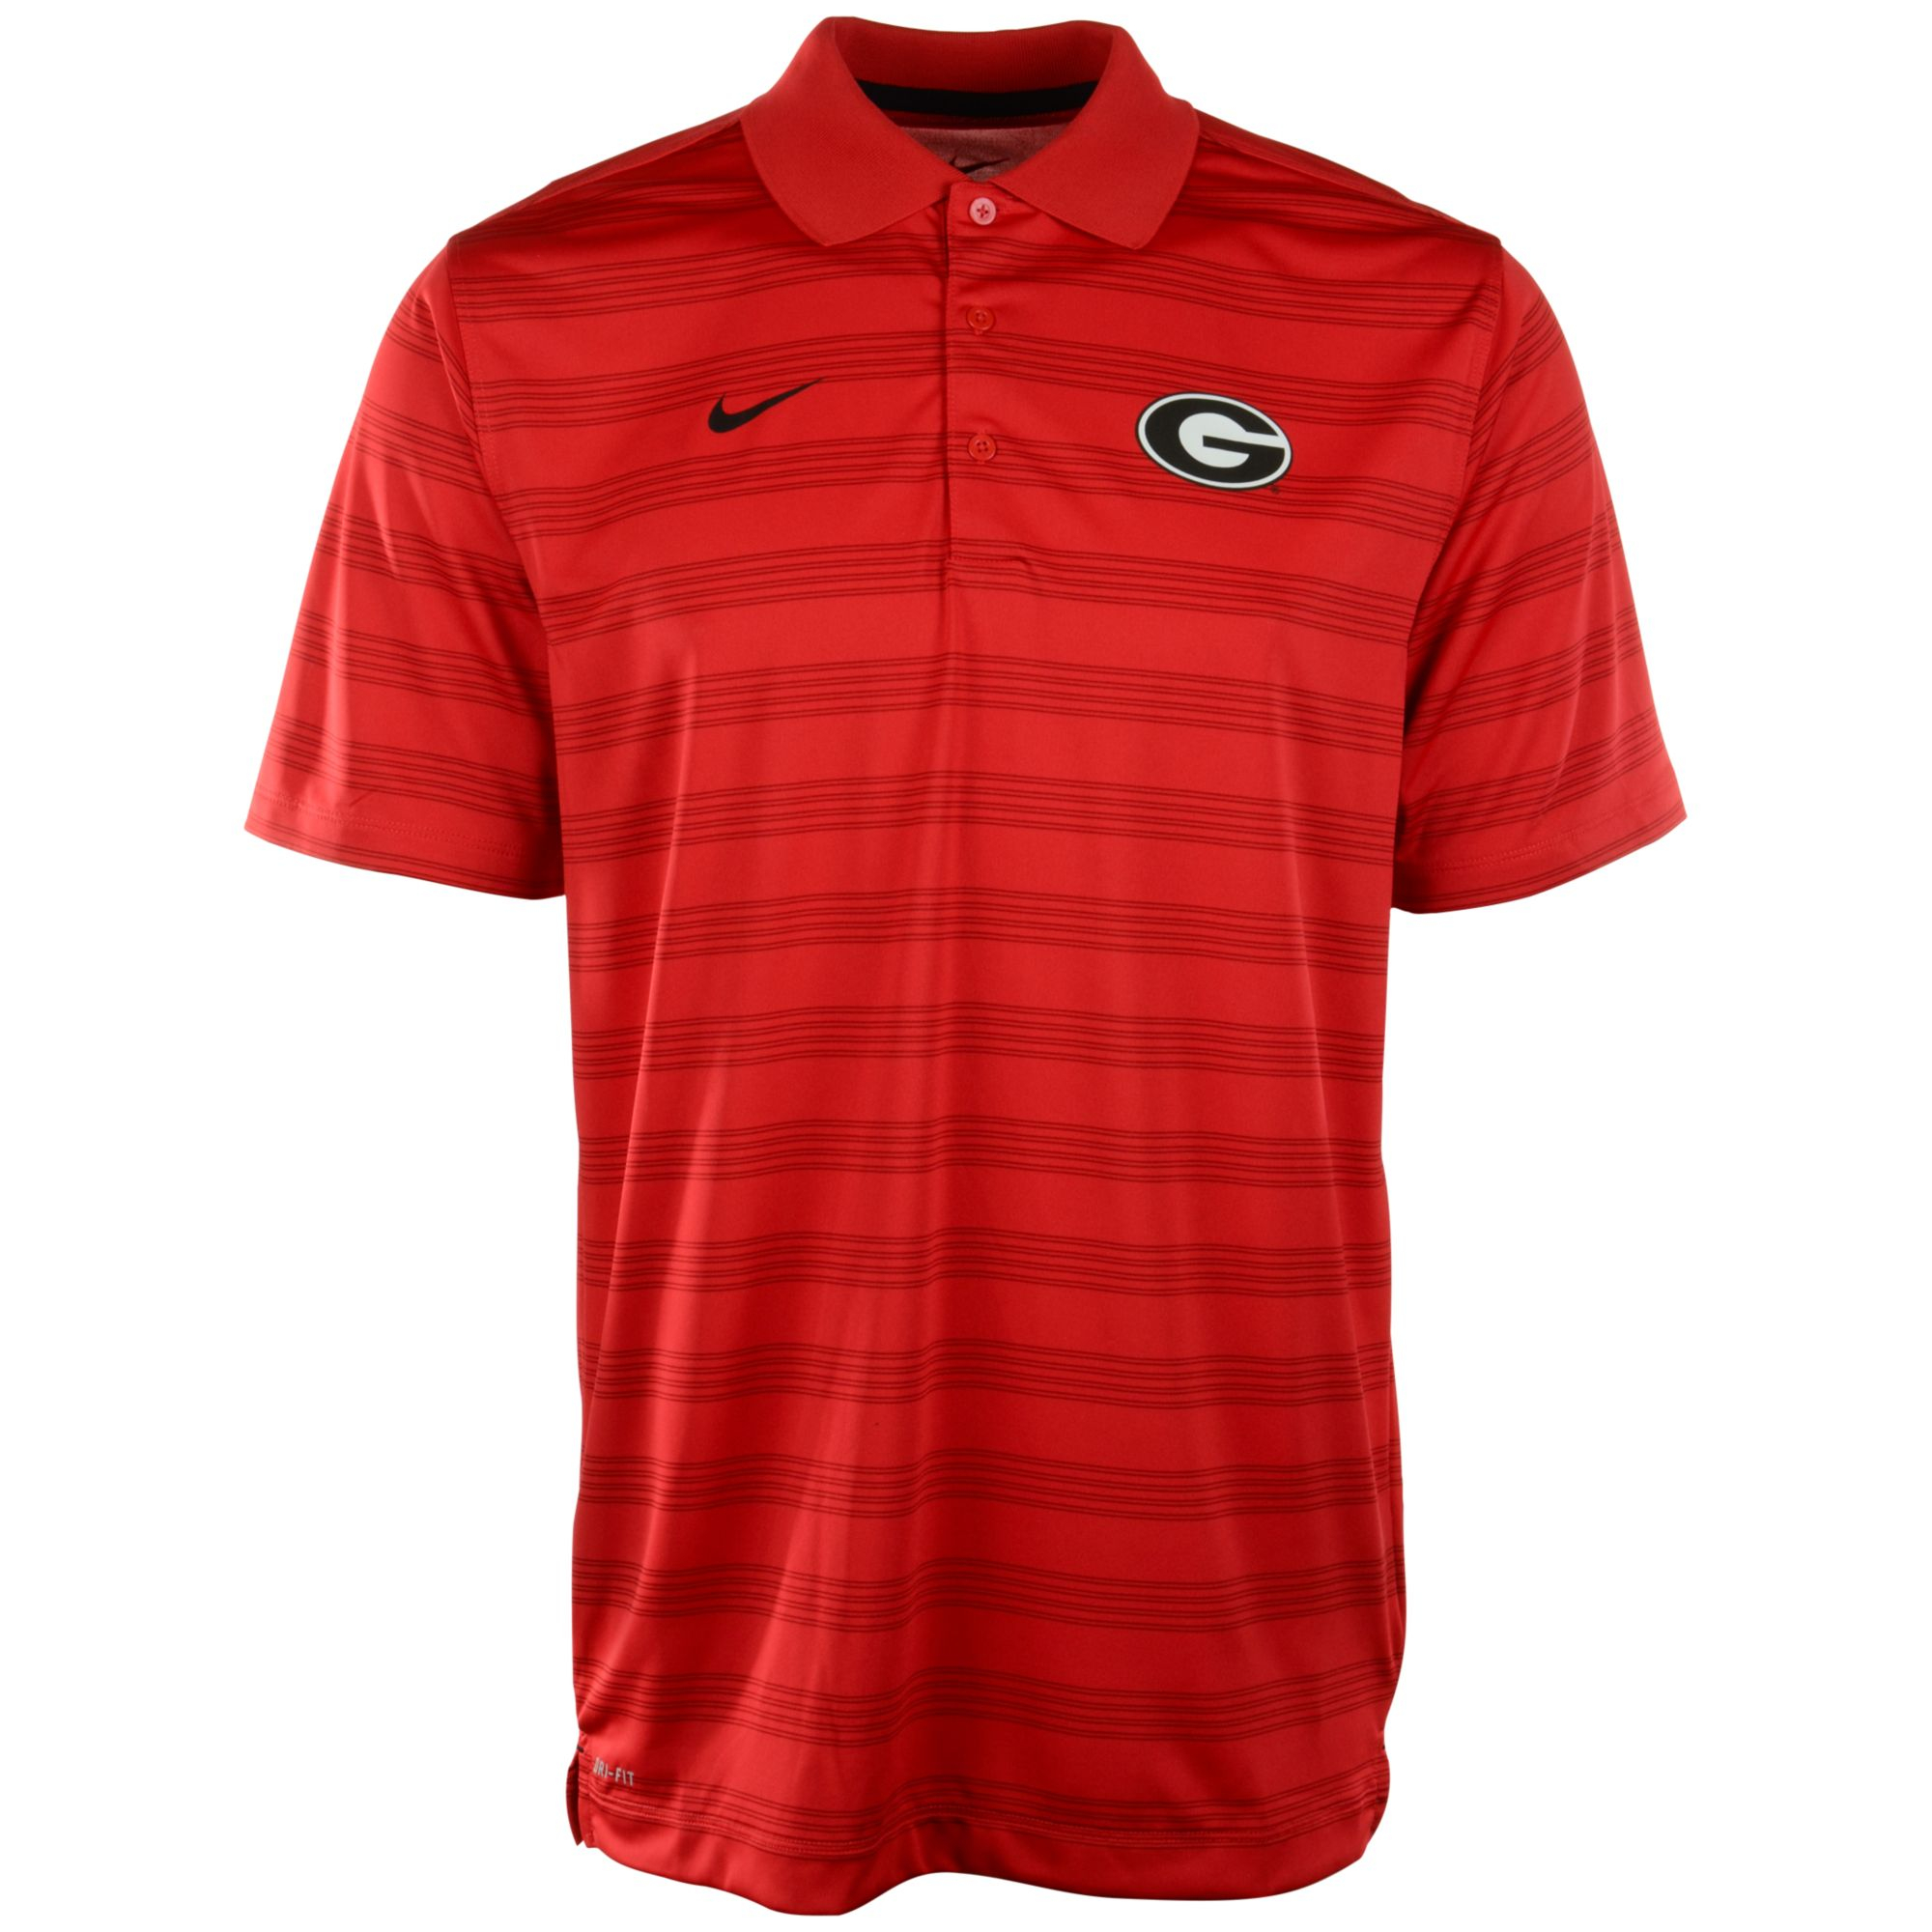 Nike Men'S Georgia Bulldogs Dri-Fit Preseason Polo Shirt ...